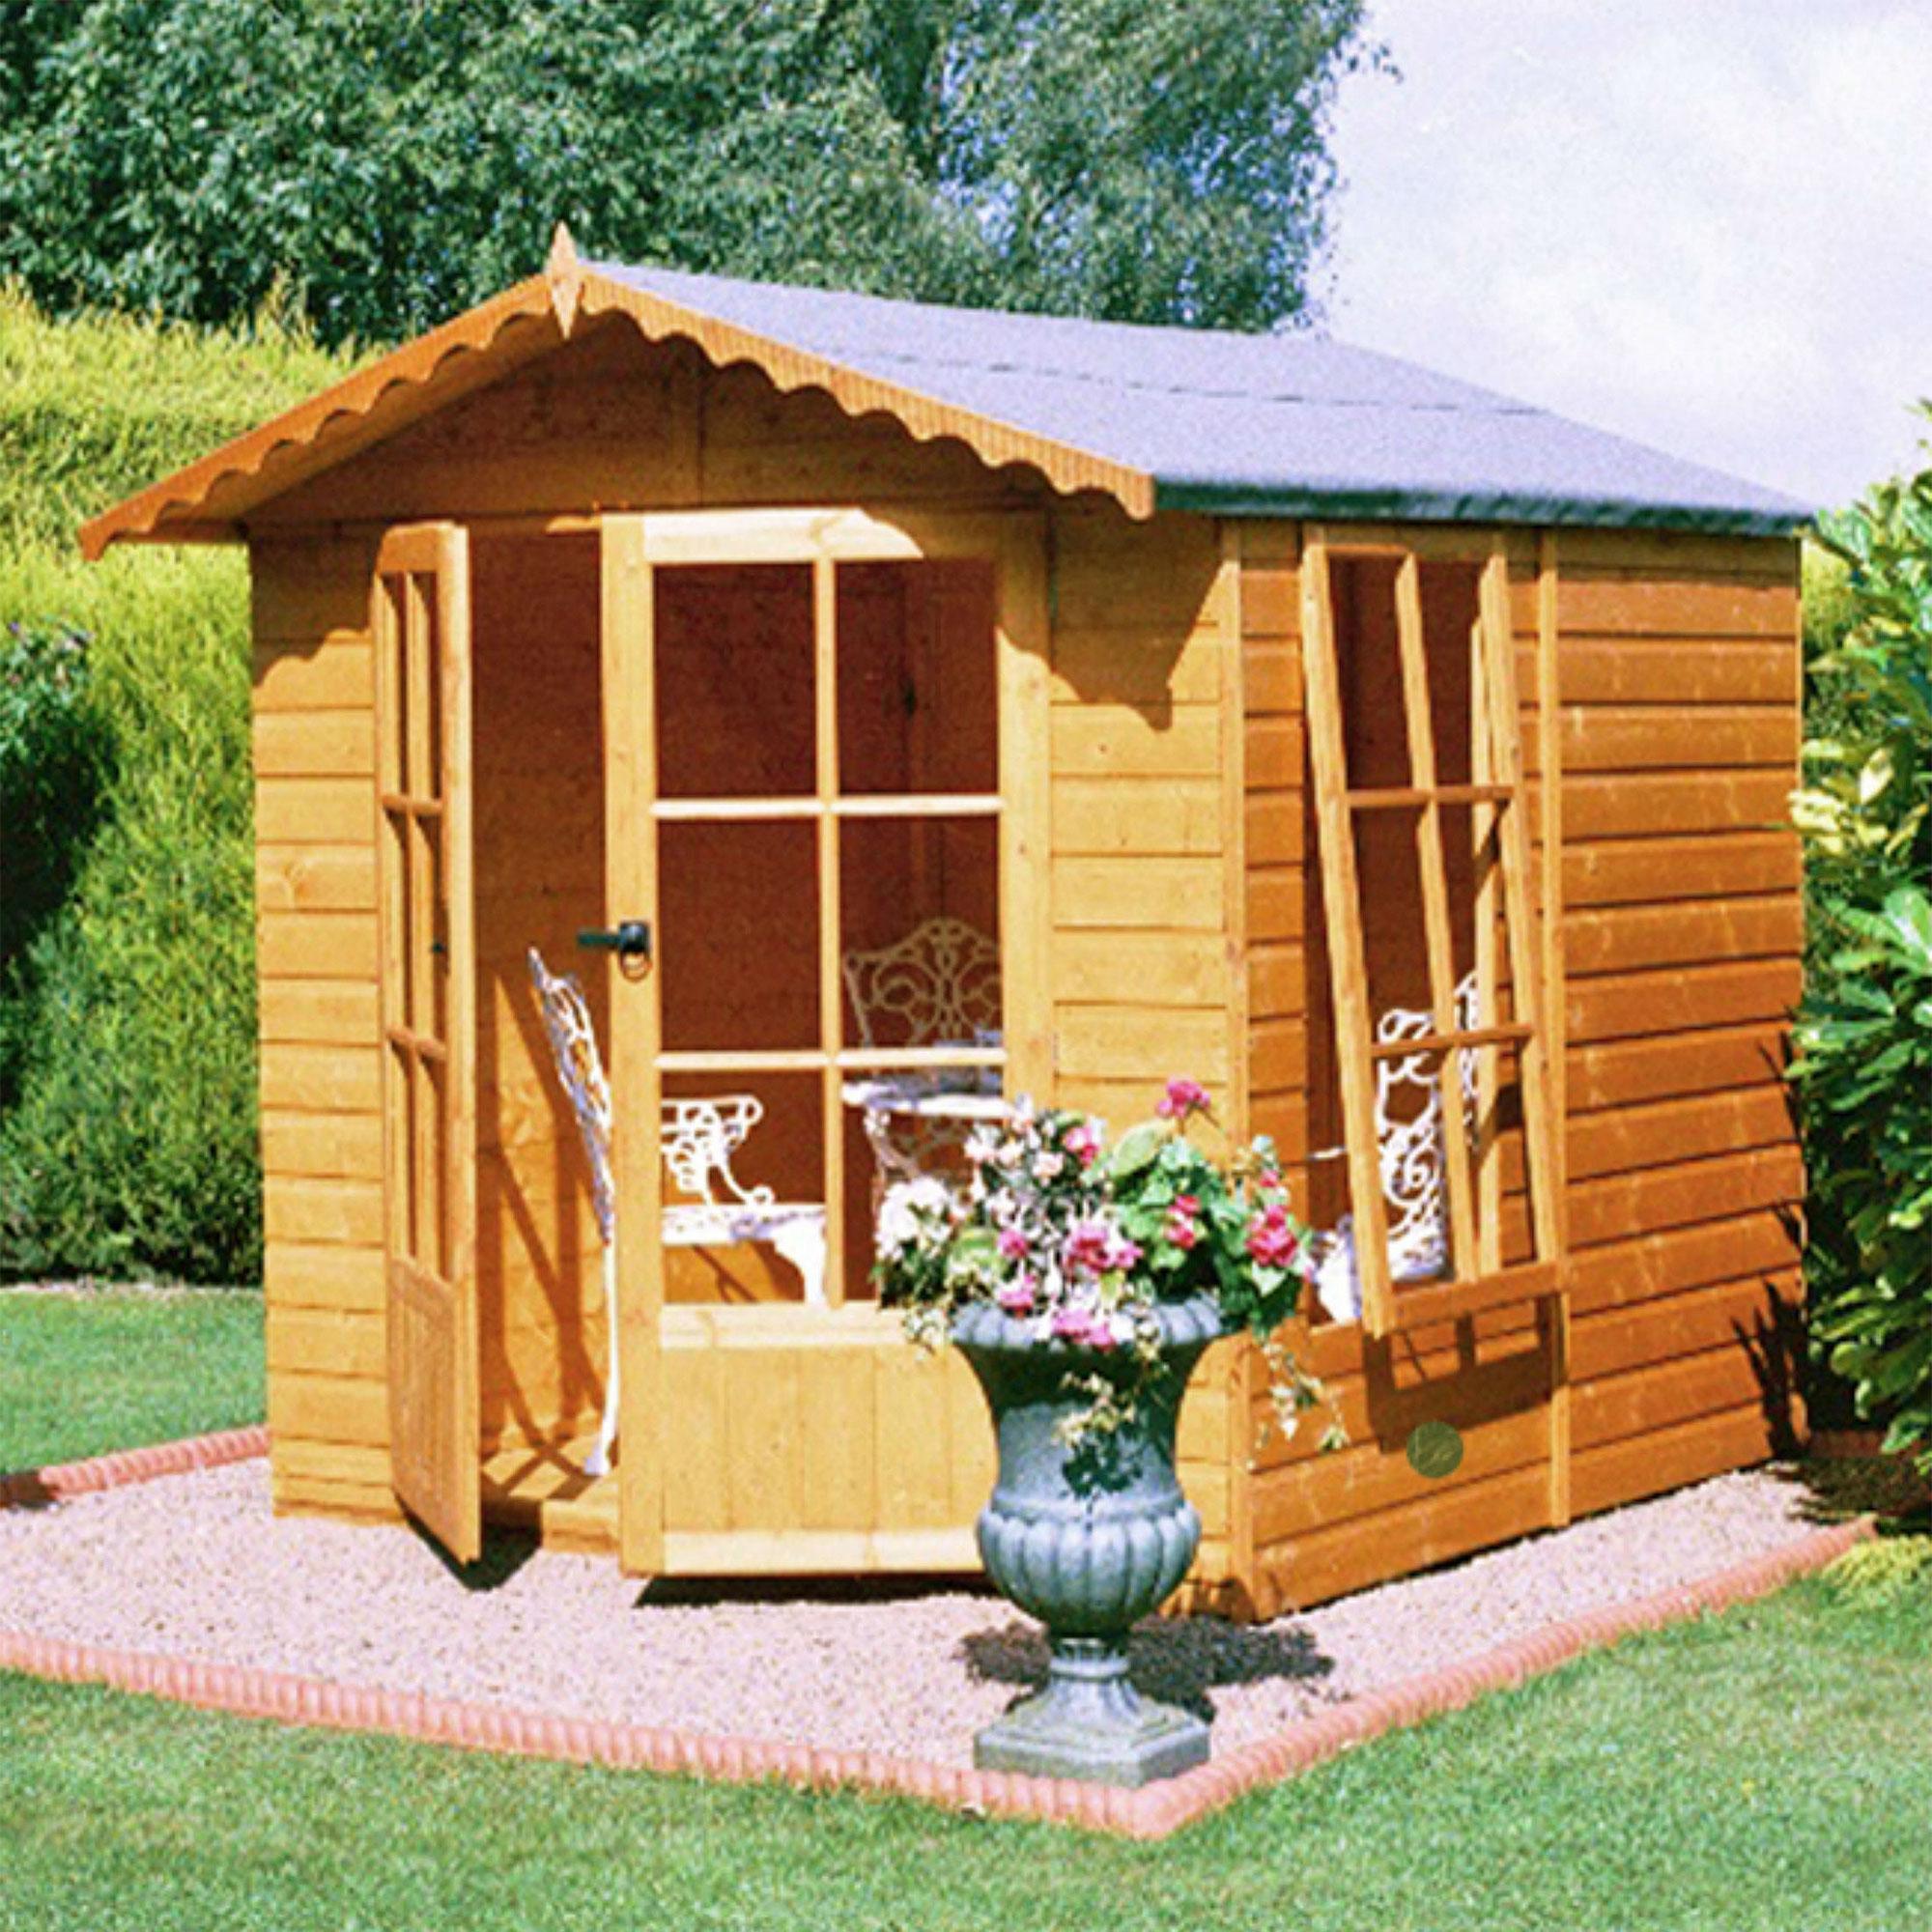 Image of 6'6 x 6'9 Shire Buckingham Garden Summerhouse